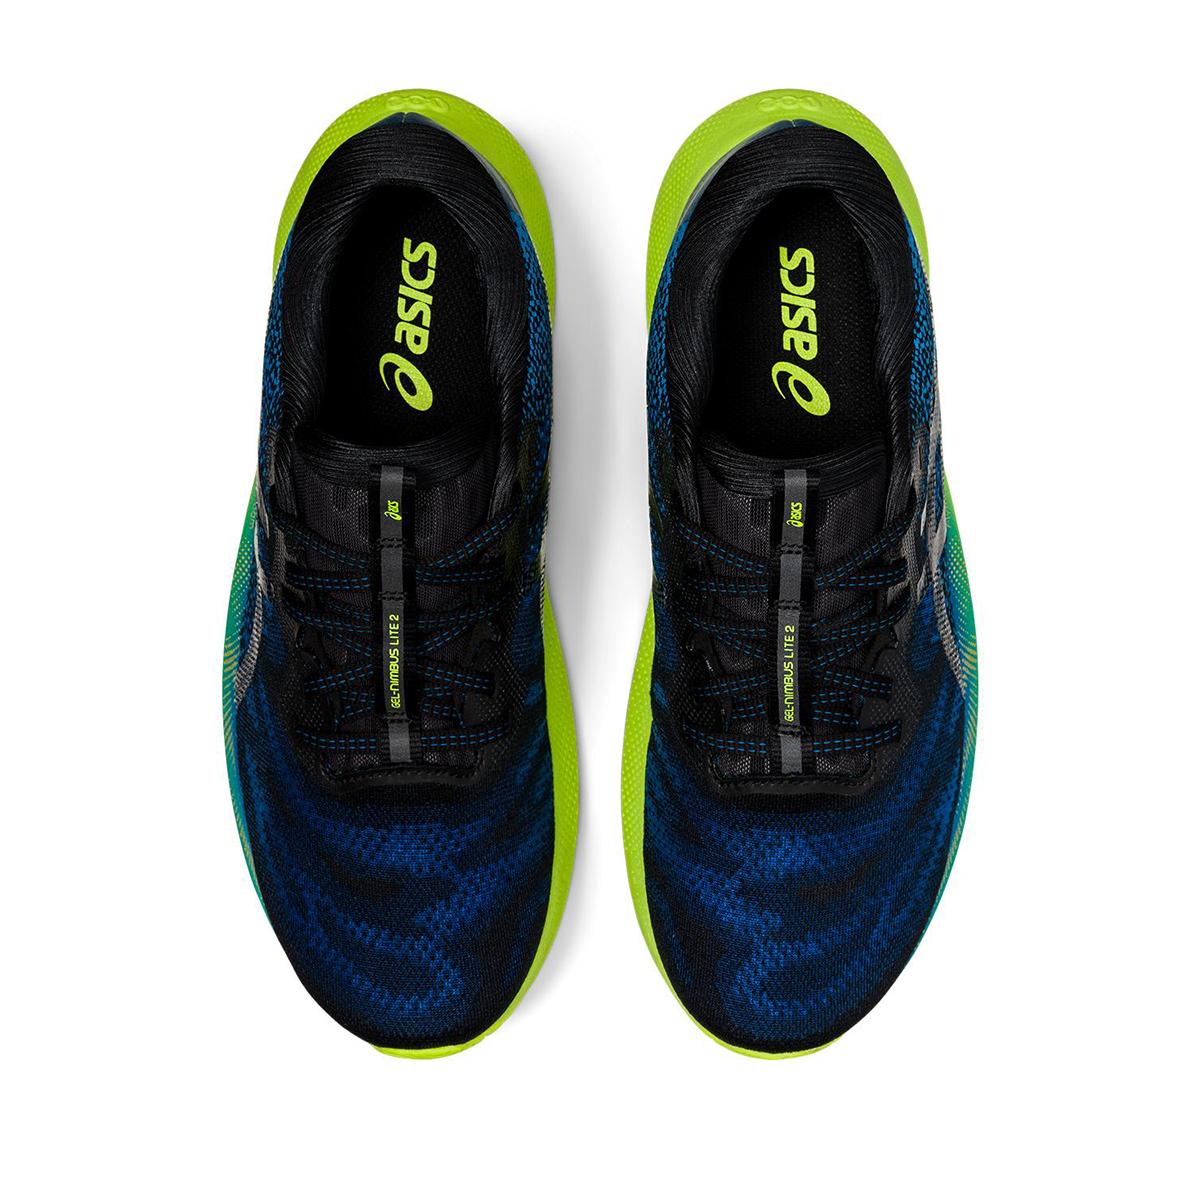 Men's Asics Gel-Nimbus Lite 2 Running Shoe - Color: Reborn Blue/Black - Size: 7 - Width: Regular, Reborn Blue/Black, large, image 5